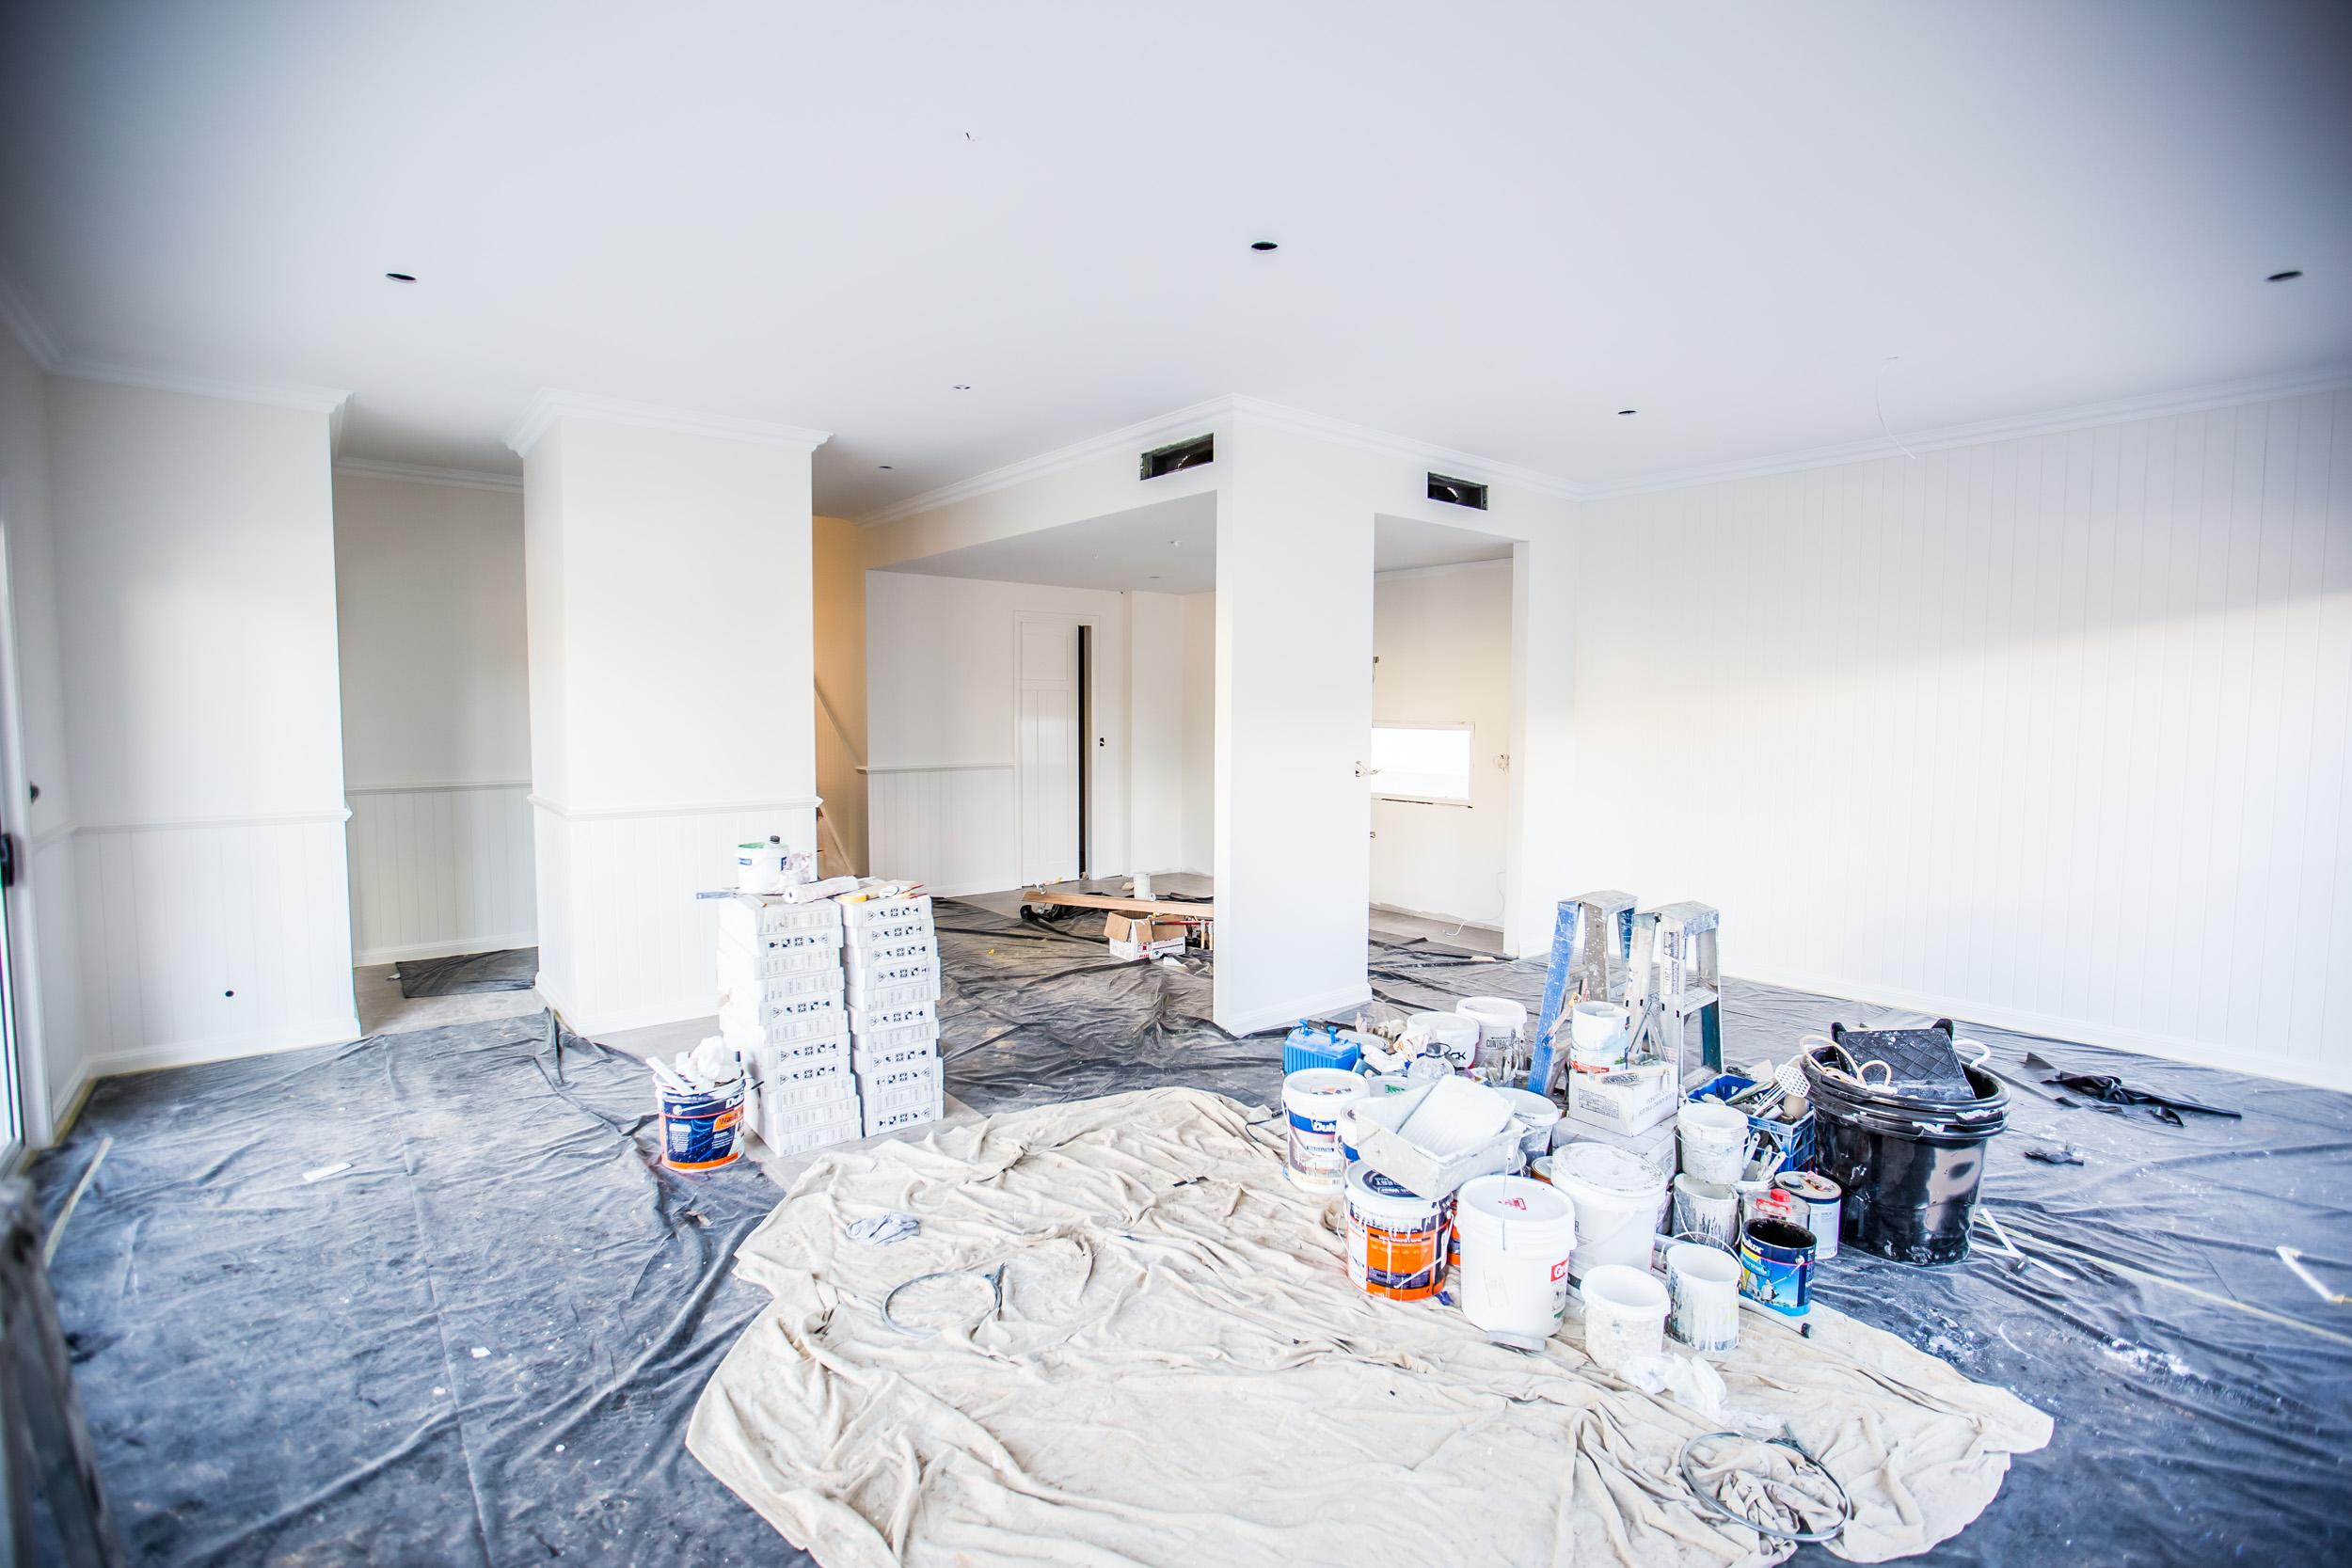 Construction Update - 28th JIMG_9283